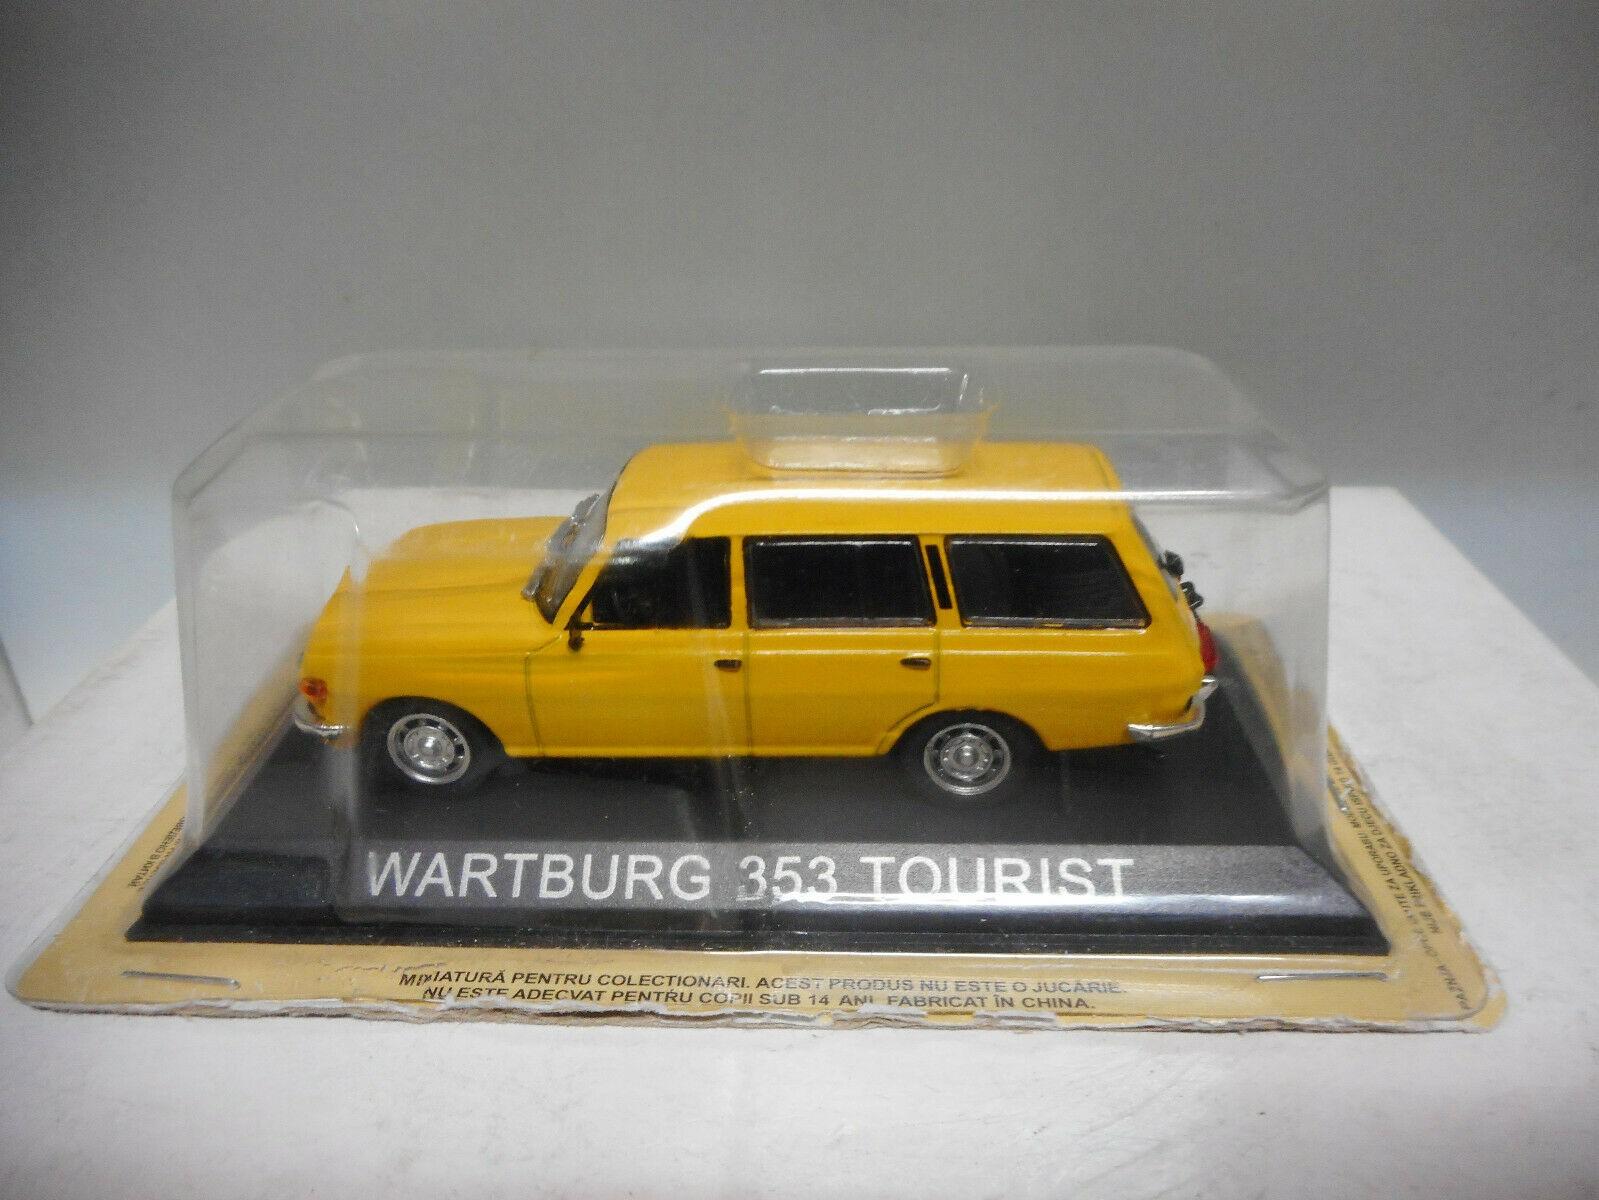 thumbnail 30 - Wartburg 311, 311-2, 313/1, 353 saloon/tourist/trans pick up atlas ixo 1:43